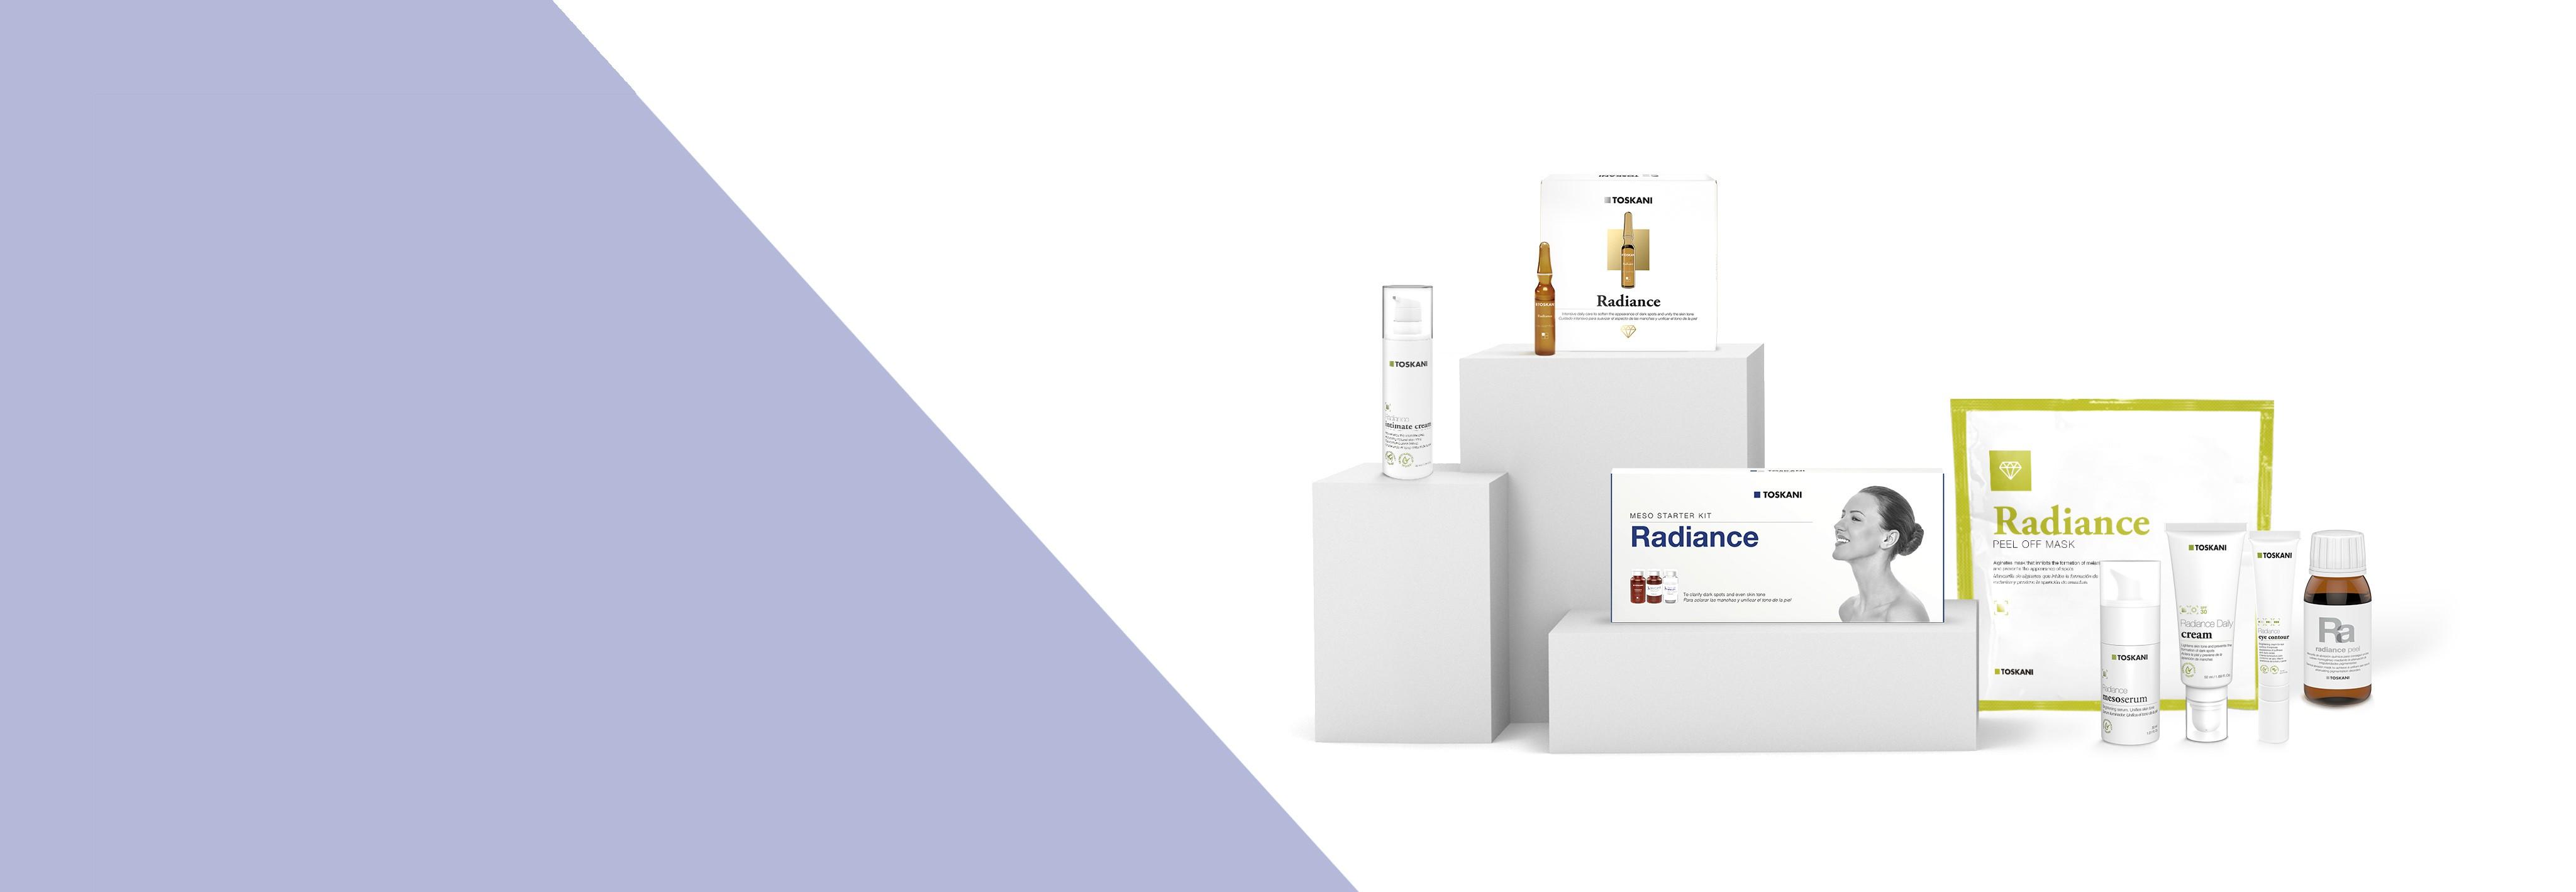 Radiance_Line